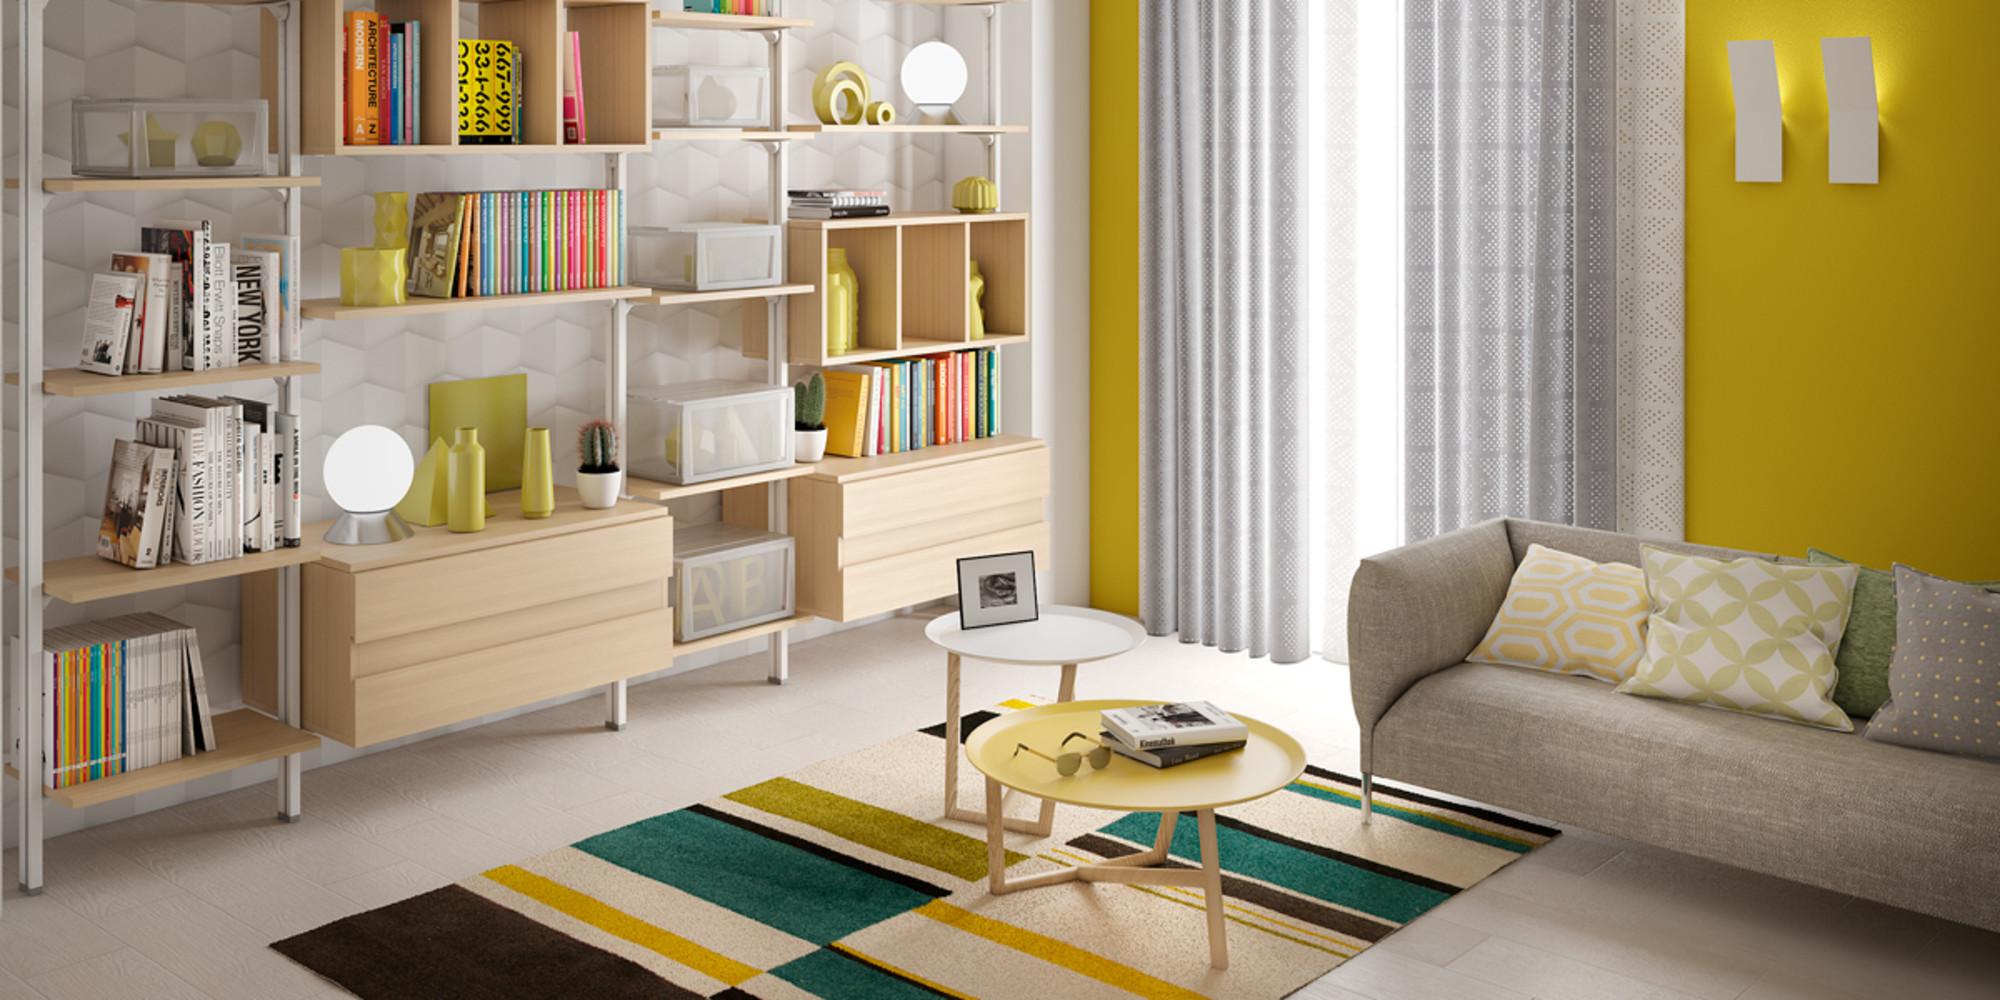 Tappeti cameretta leroy merlin beautiful tappeti cucina - Ikea firenze catalogo ...